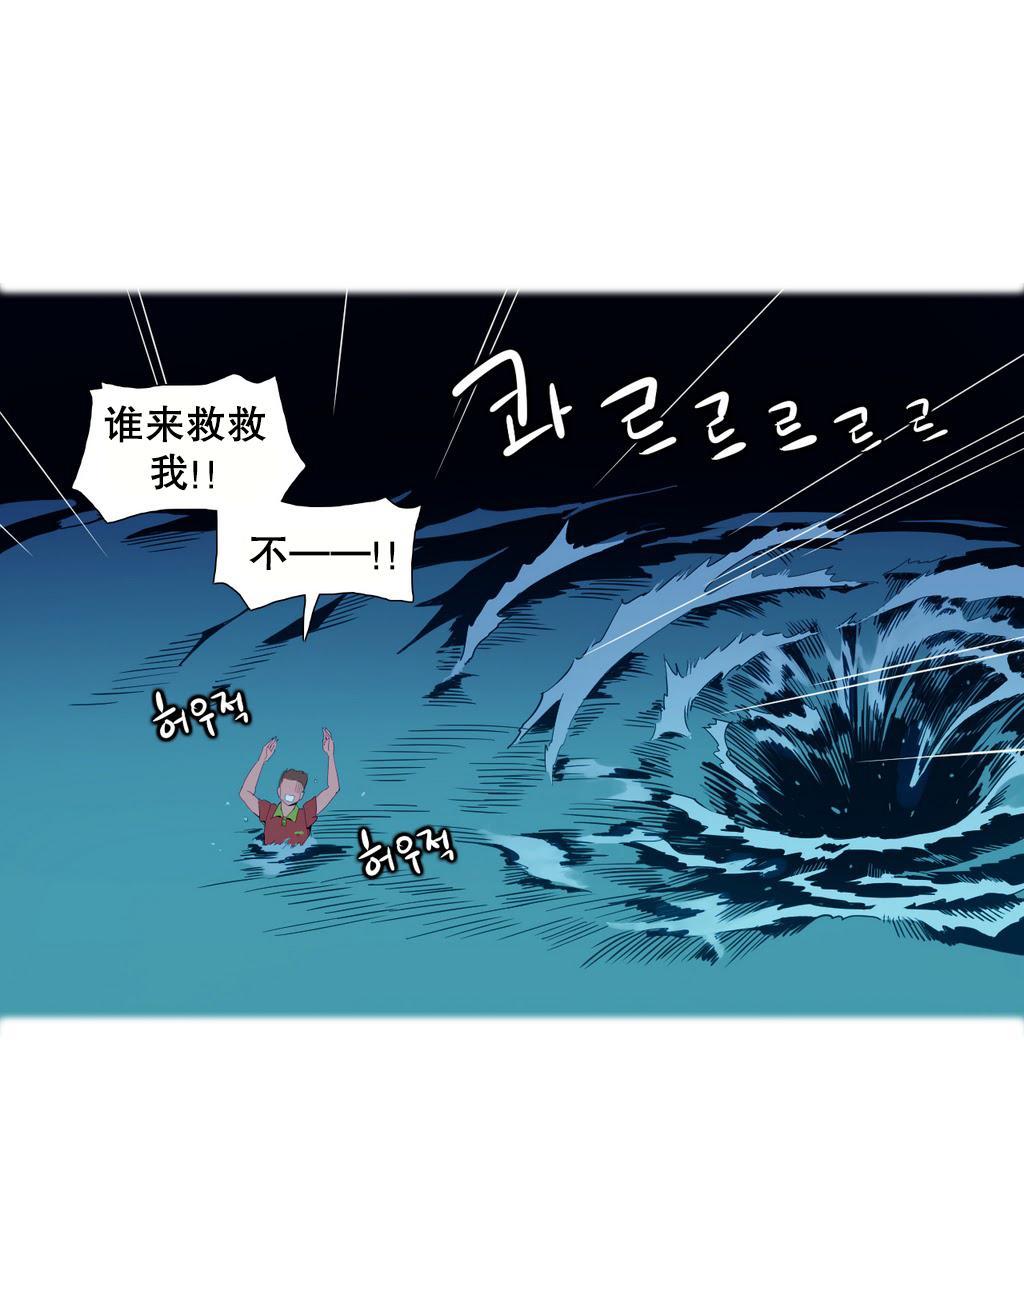 [Rozer] 一个由我统治的世界(A World that I Rule) Ch.1-3 [Chinese] 37